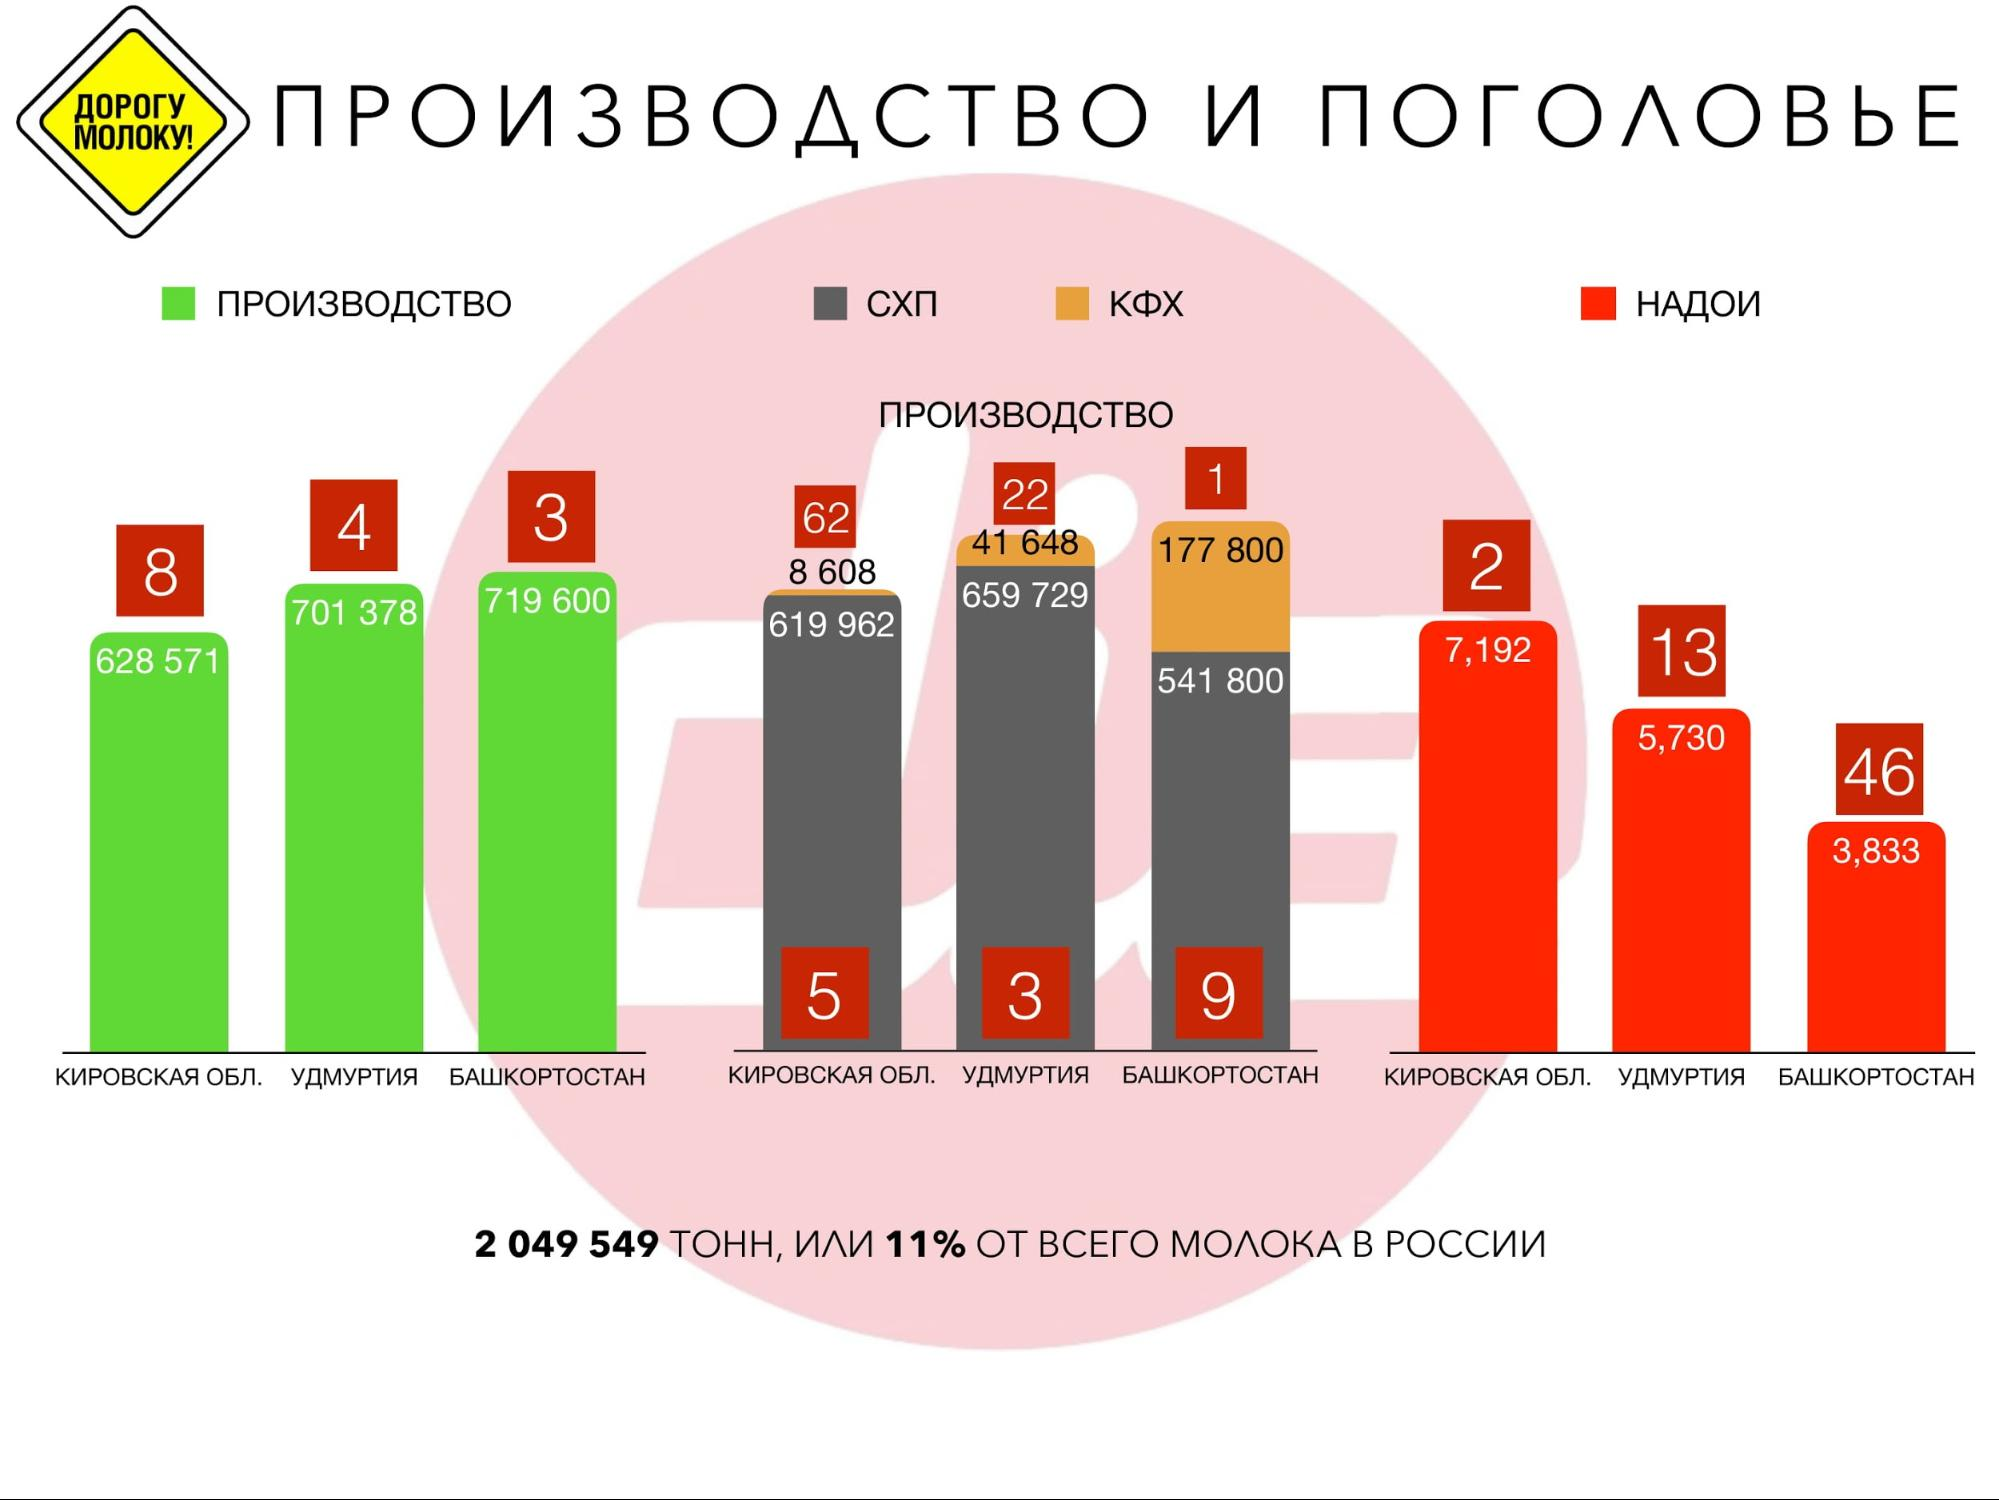 https://www.dairynews.ru/news-image/2019/aug/20190827/251.jpg